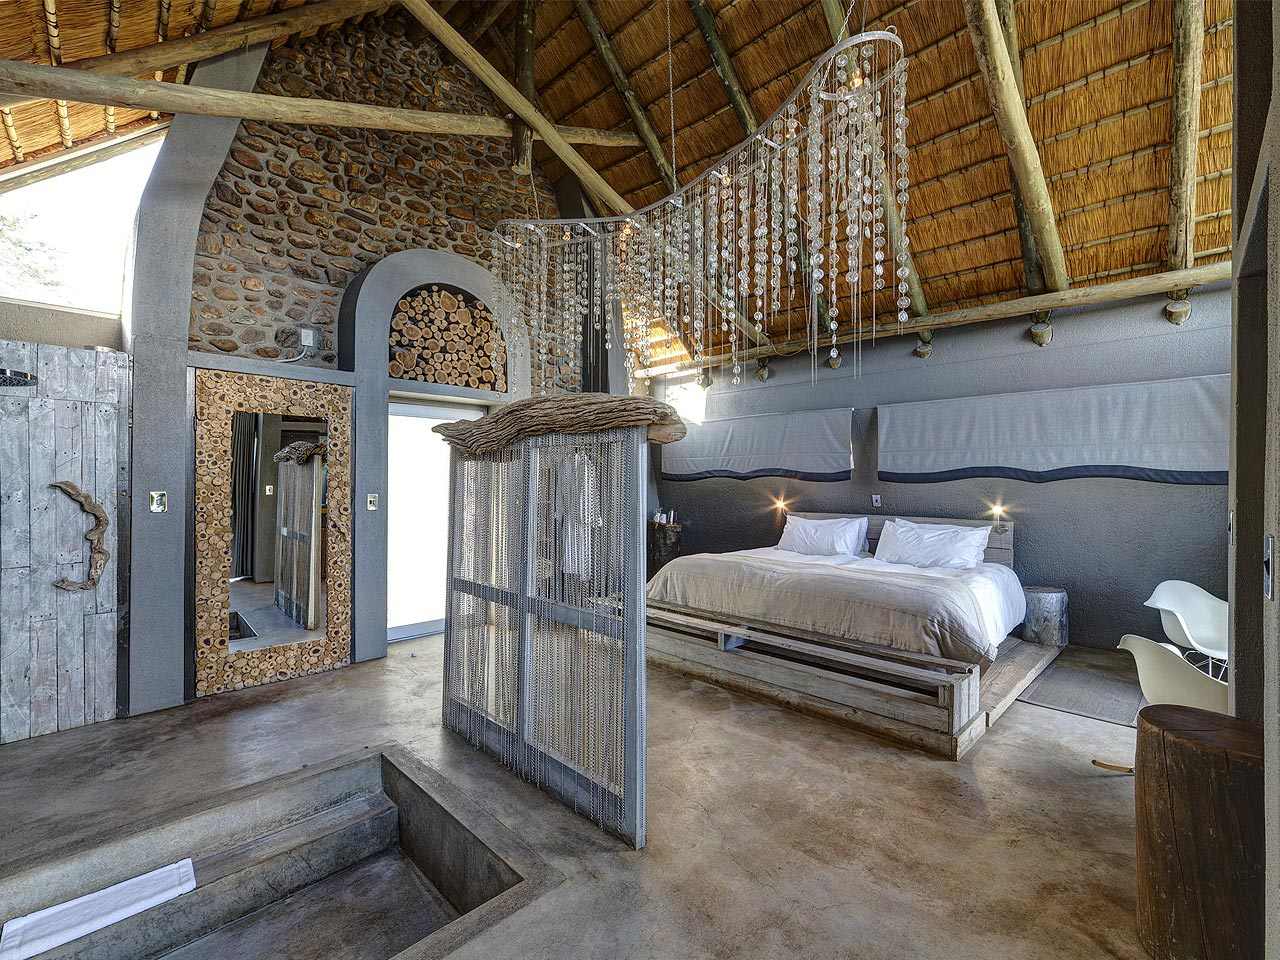 N/a'ankuse Lodge & Wildlife Sanctuary